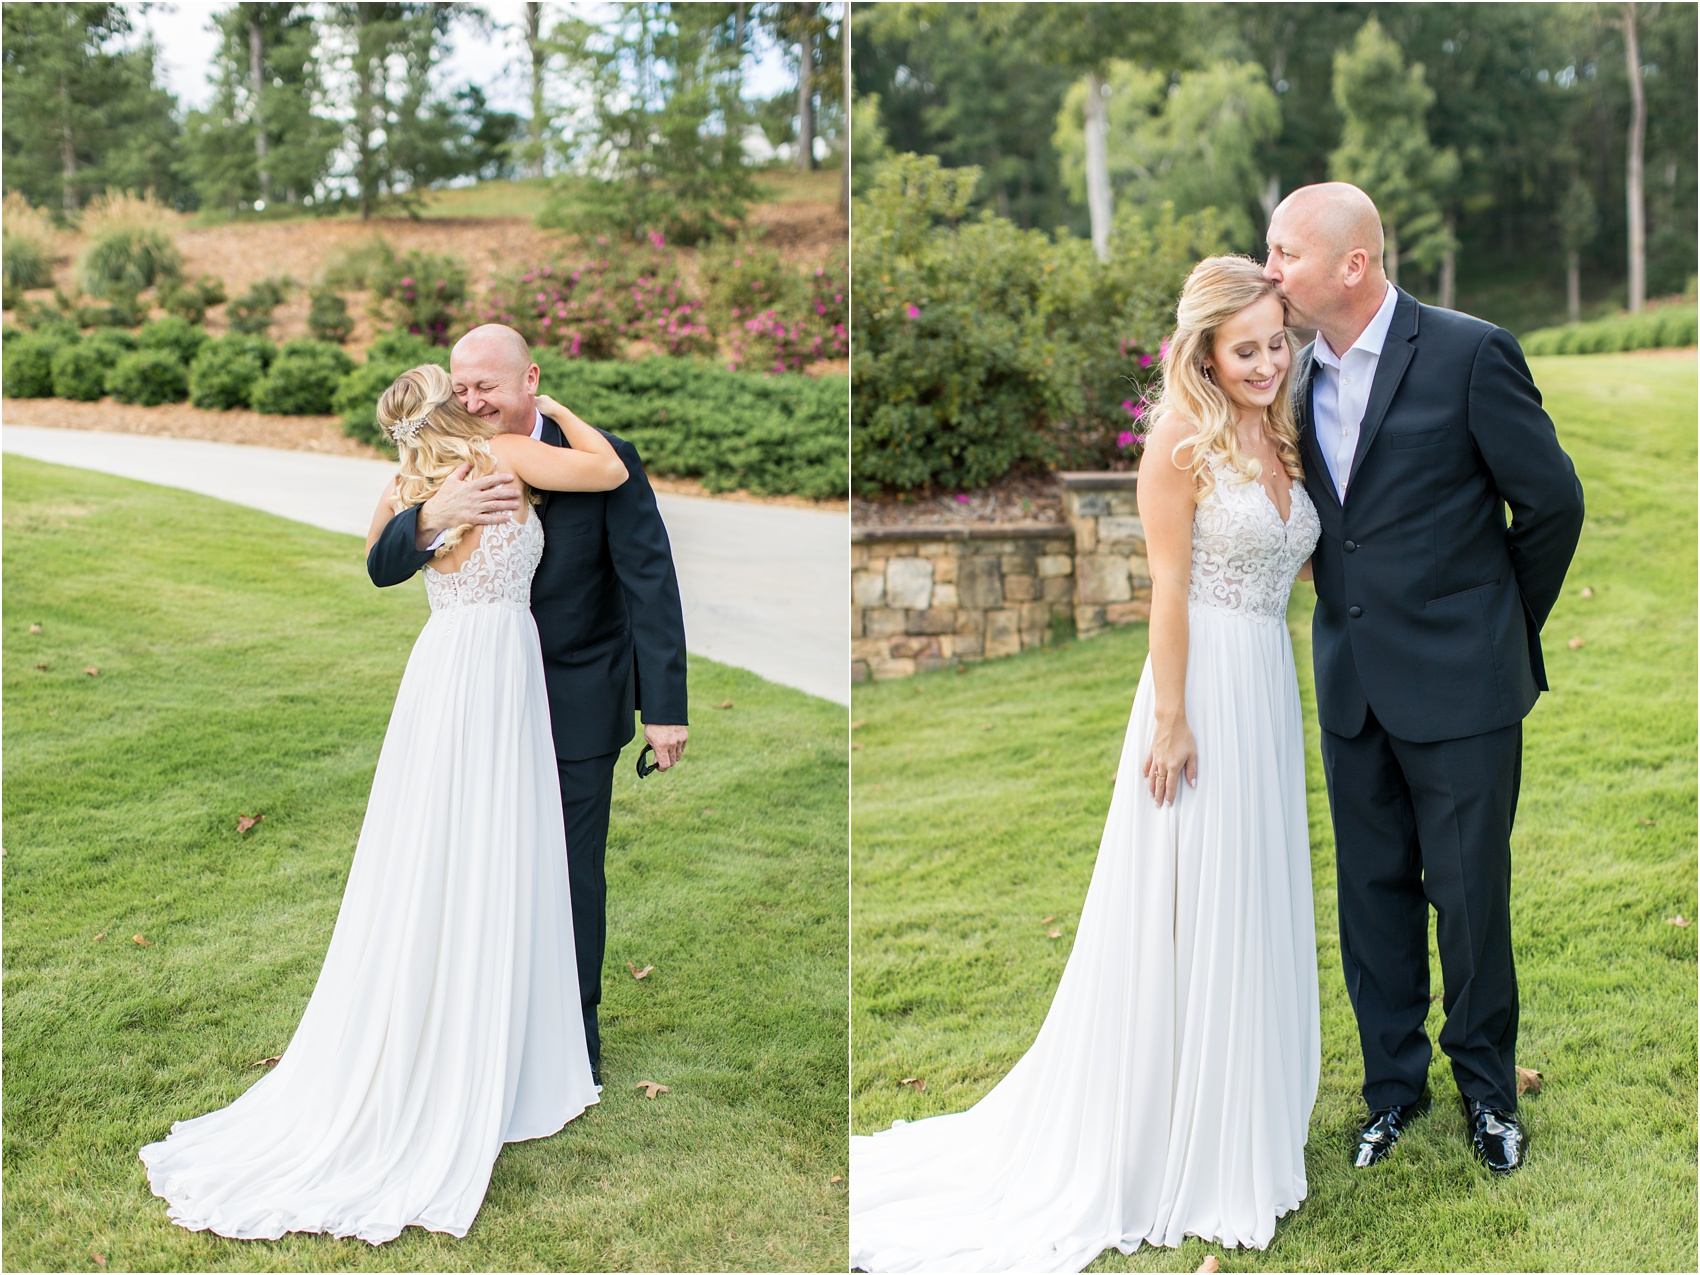 Savannah Eve Photography- Jurek-Woodworth Wedding- Sneak Peek-15.jpg